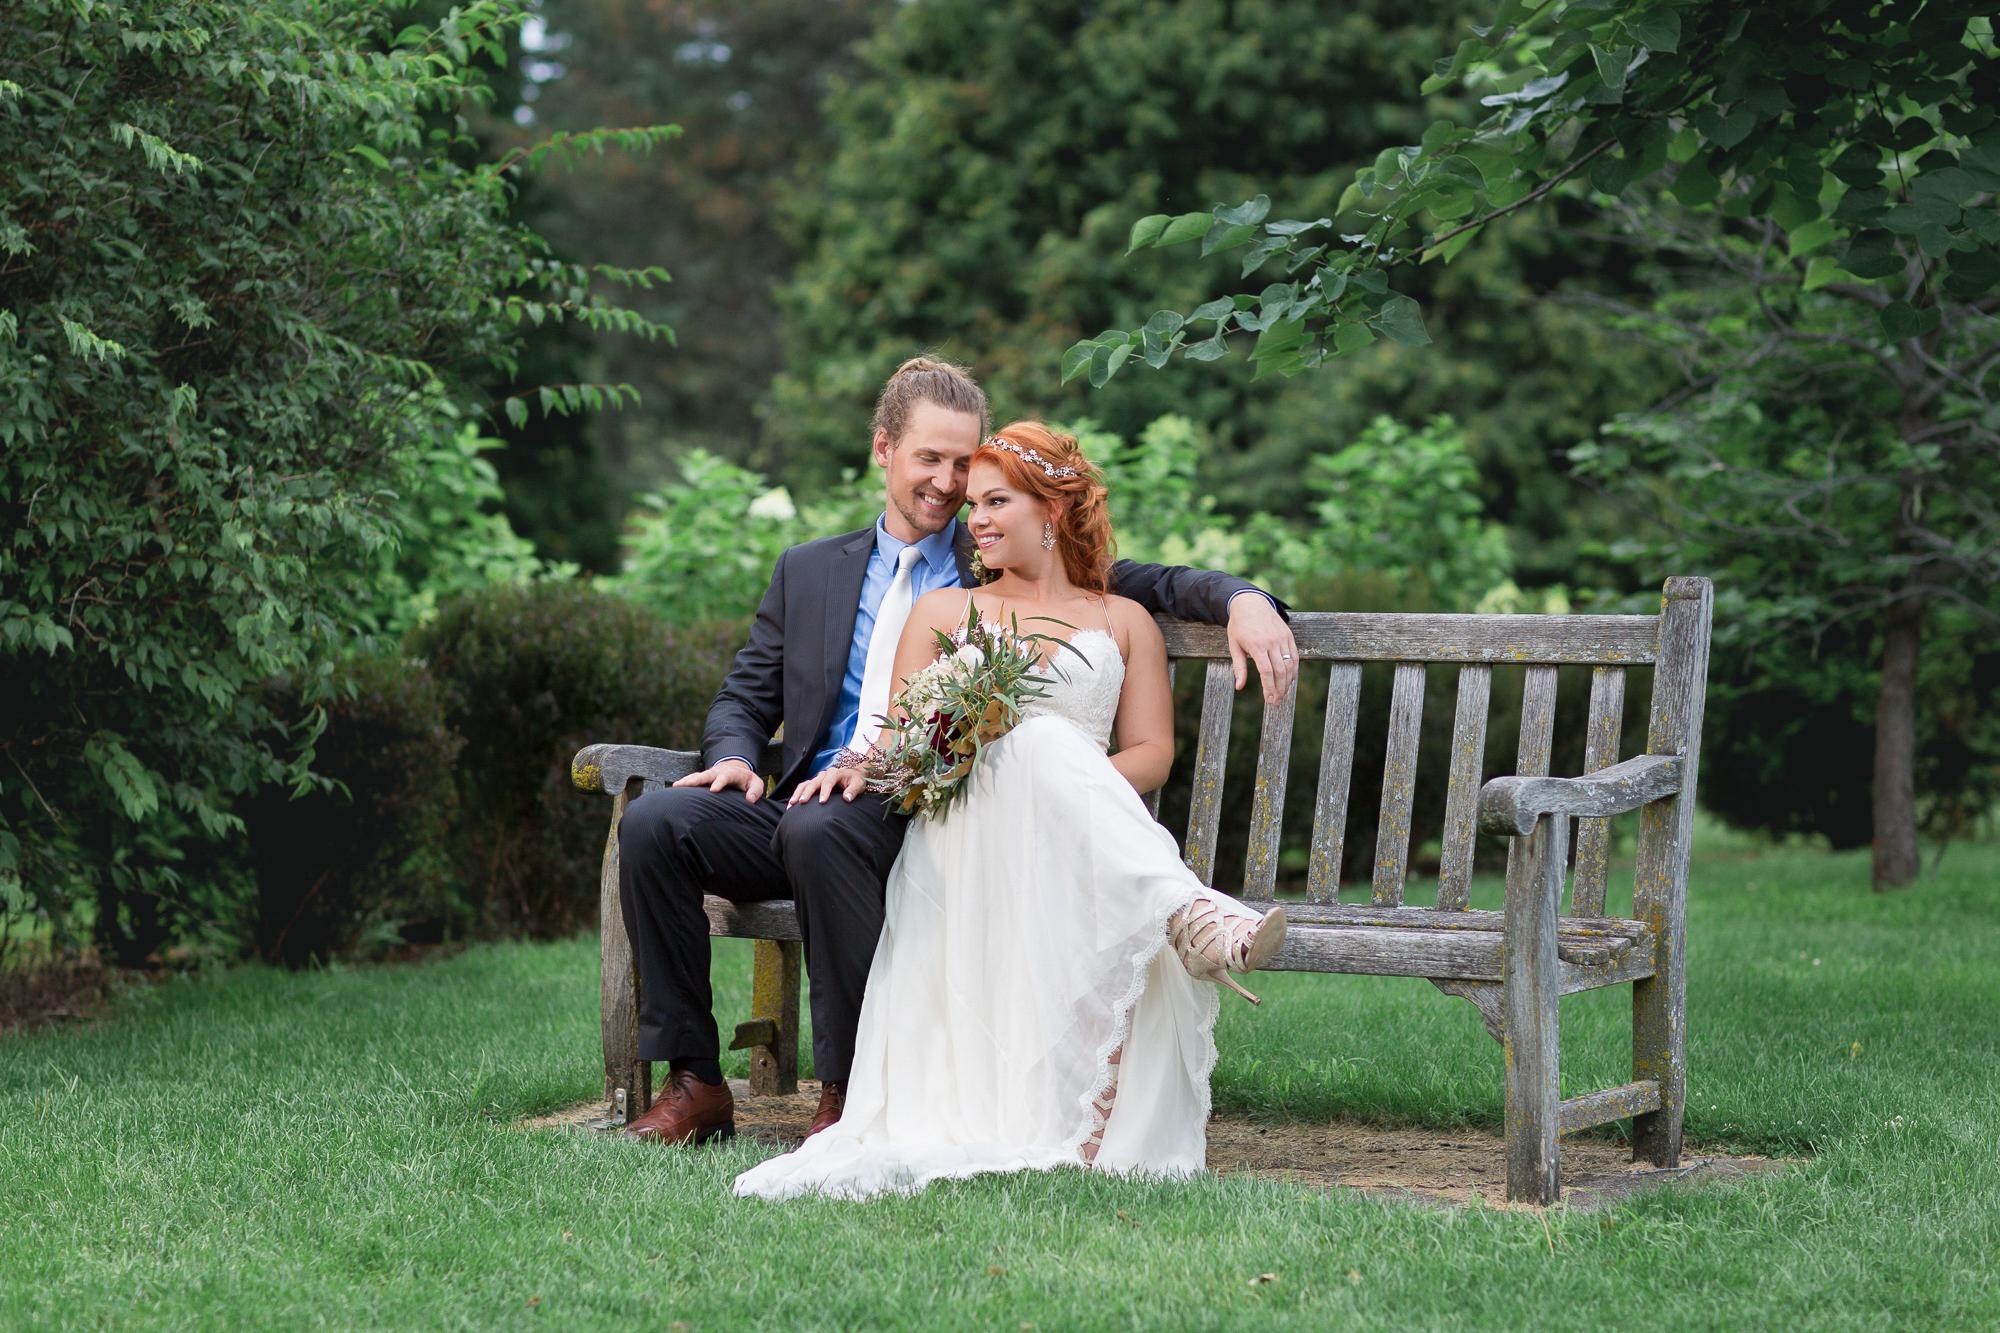 San Diego Wedding and Destination Wedding Photography Blessed Weddings 18.jpg